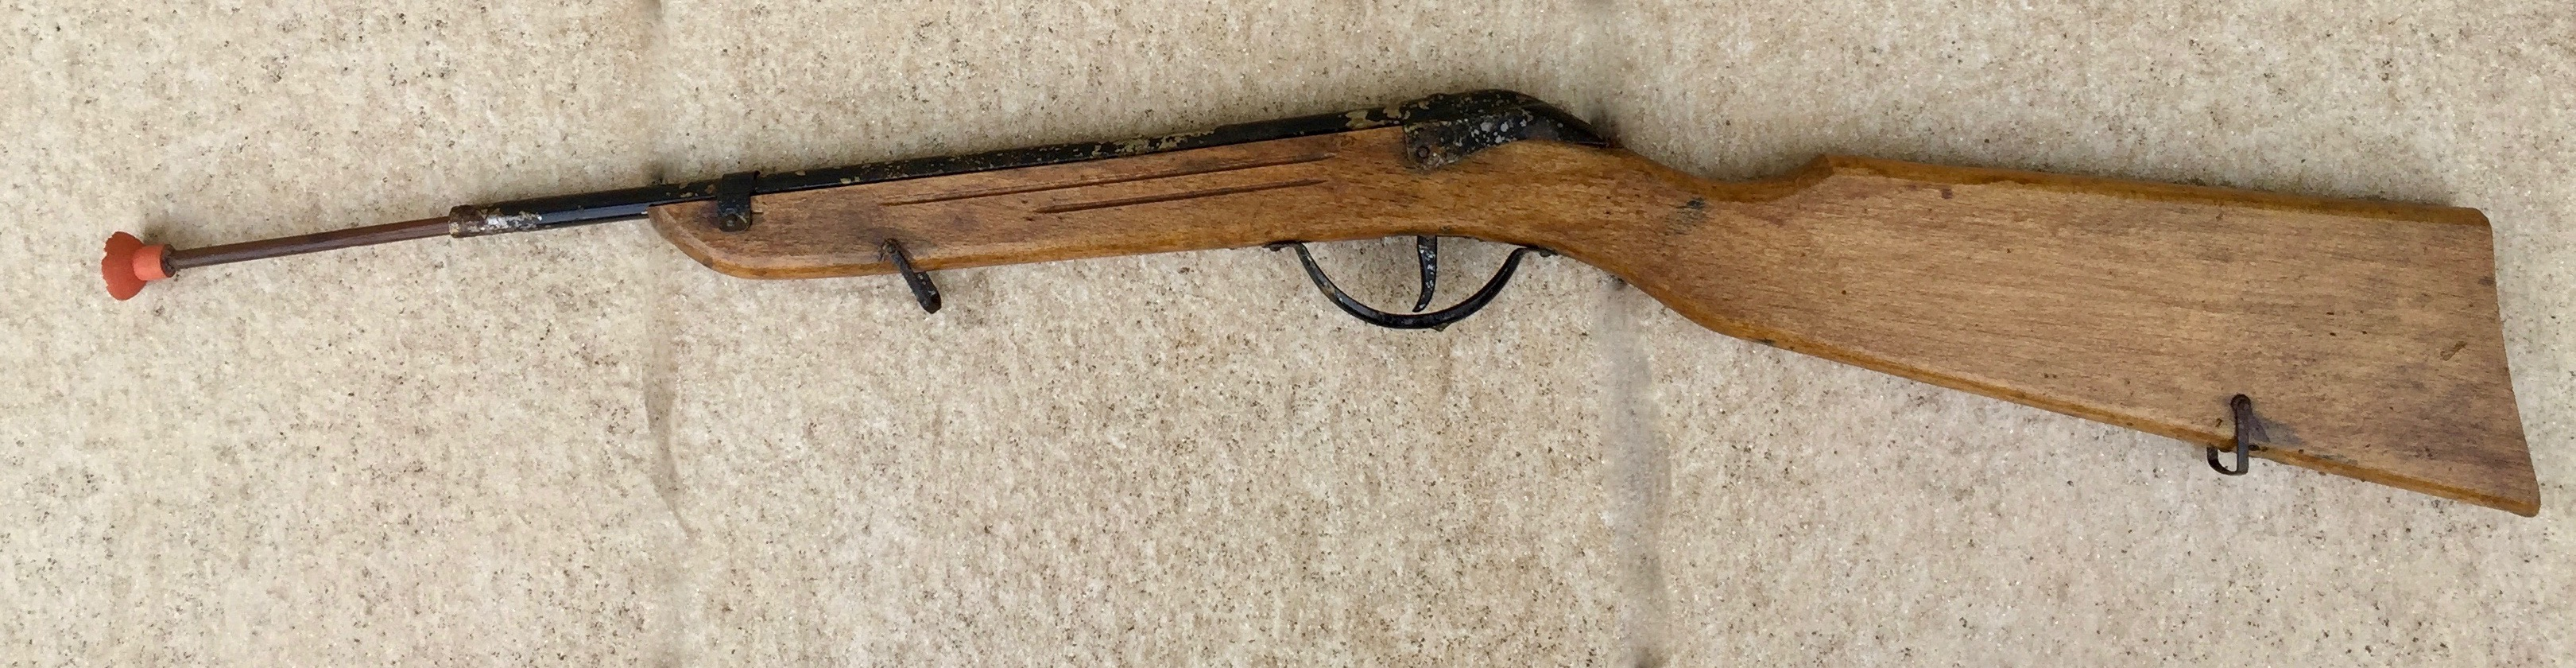 Carabine à flèche